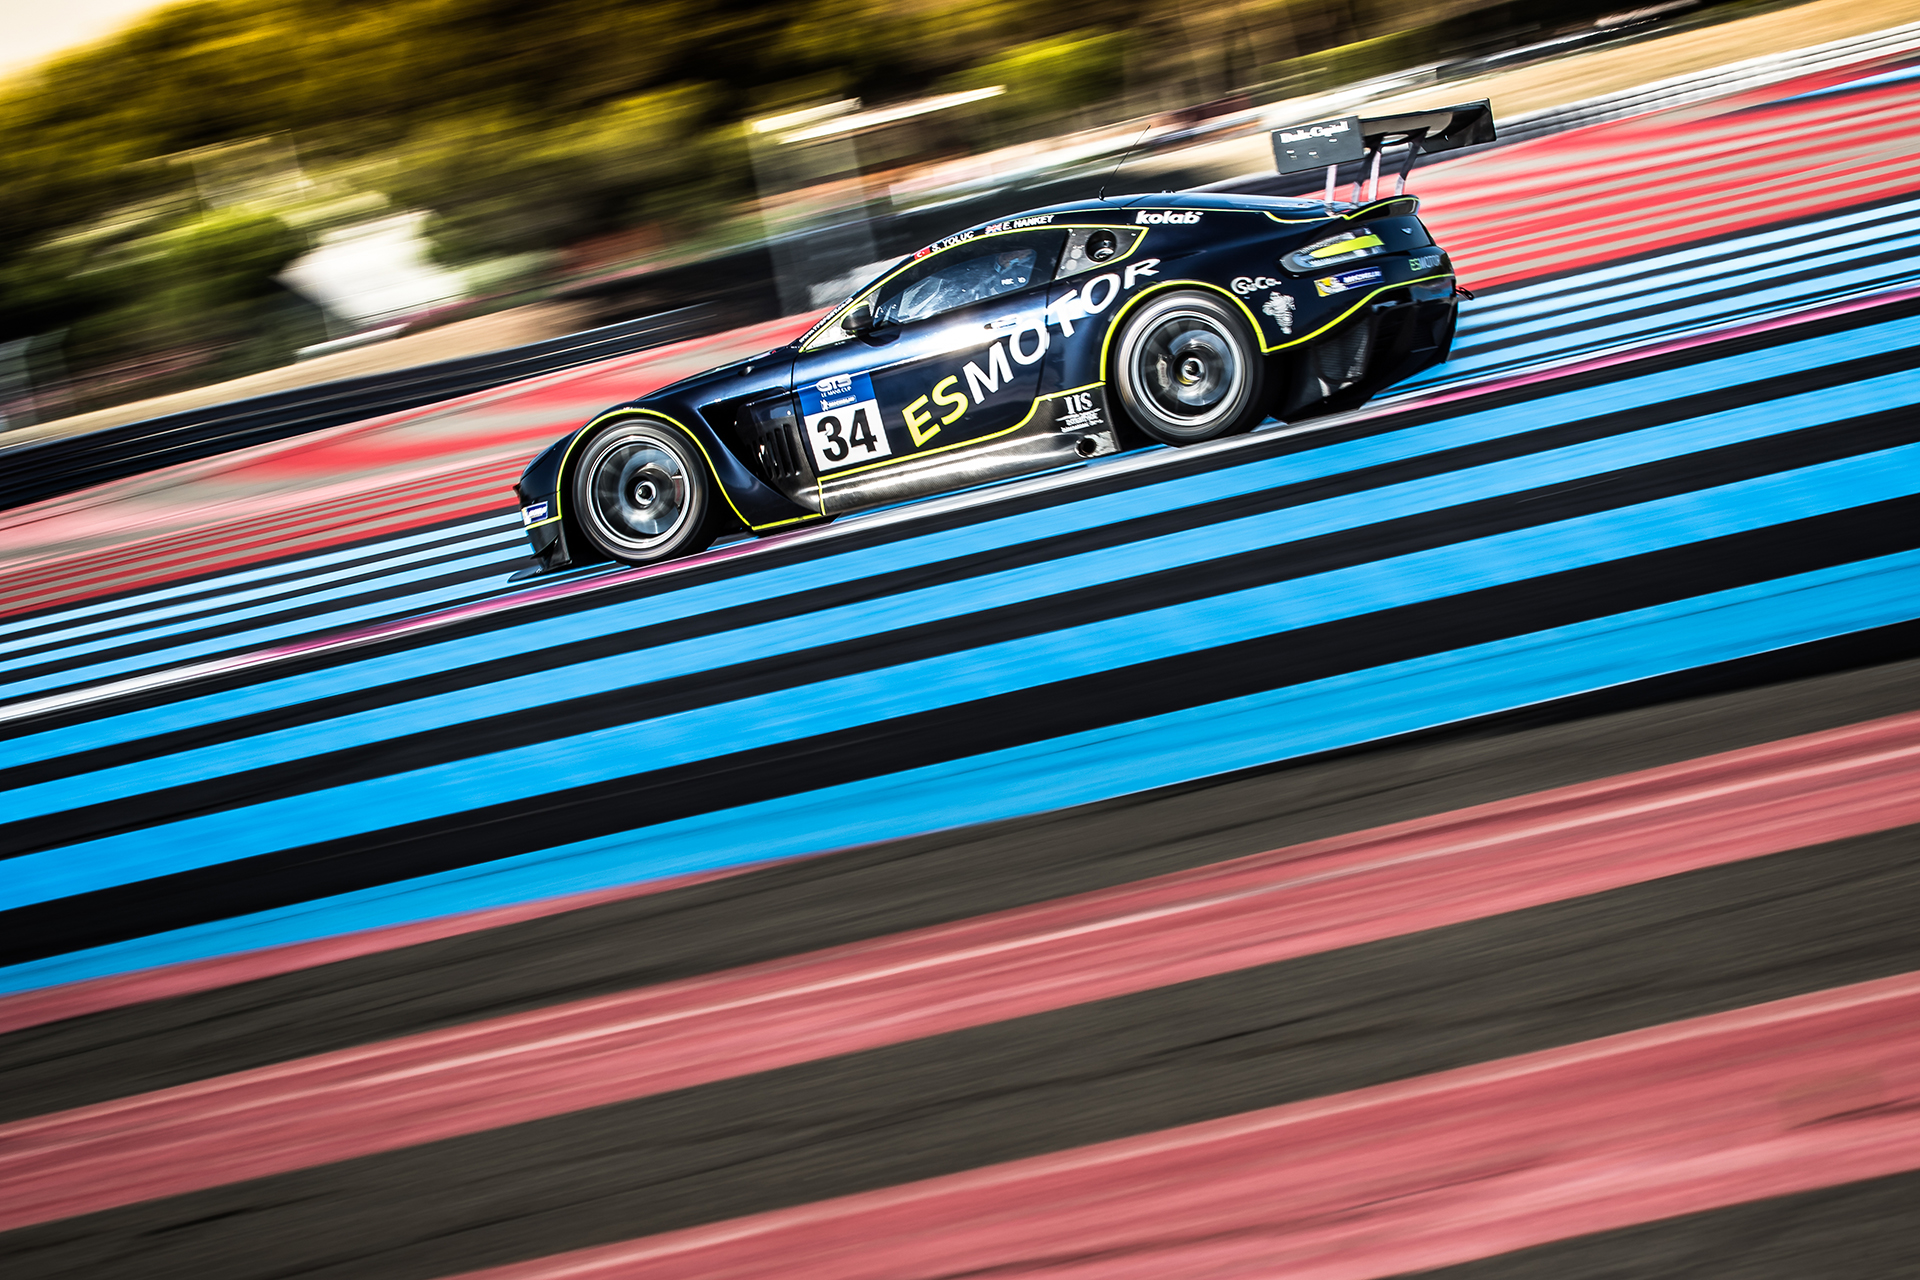 2016-GT3-LeMansCup-PaulRicard-71655.jpg